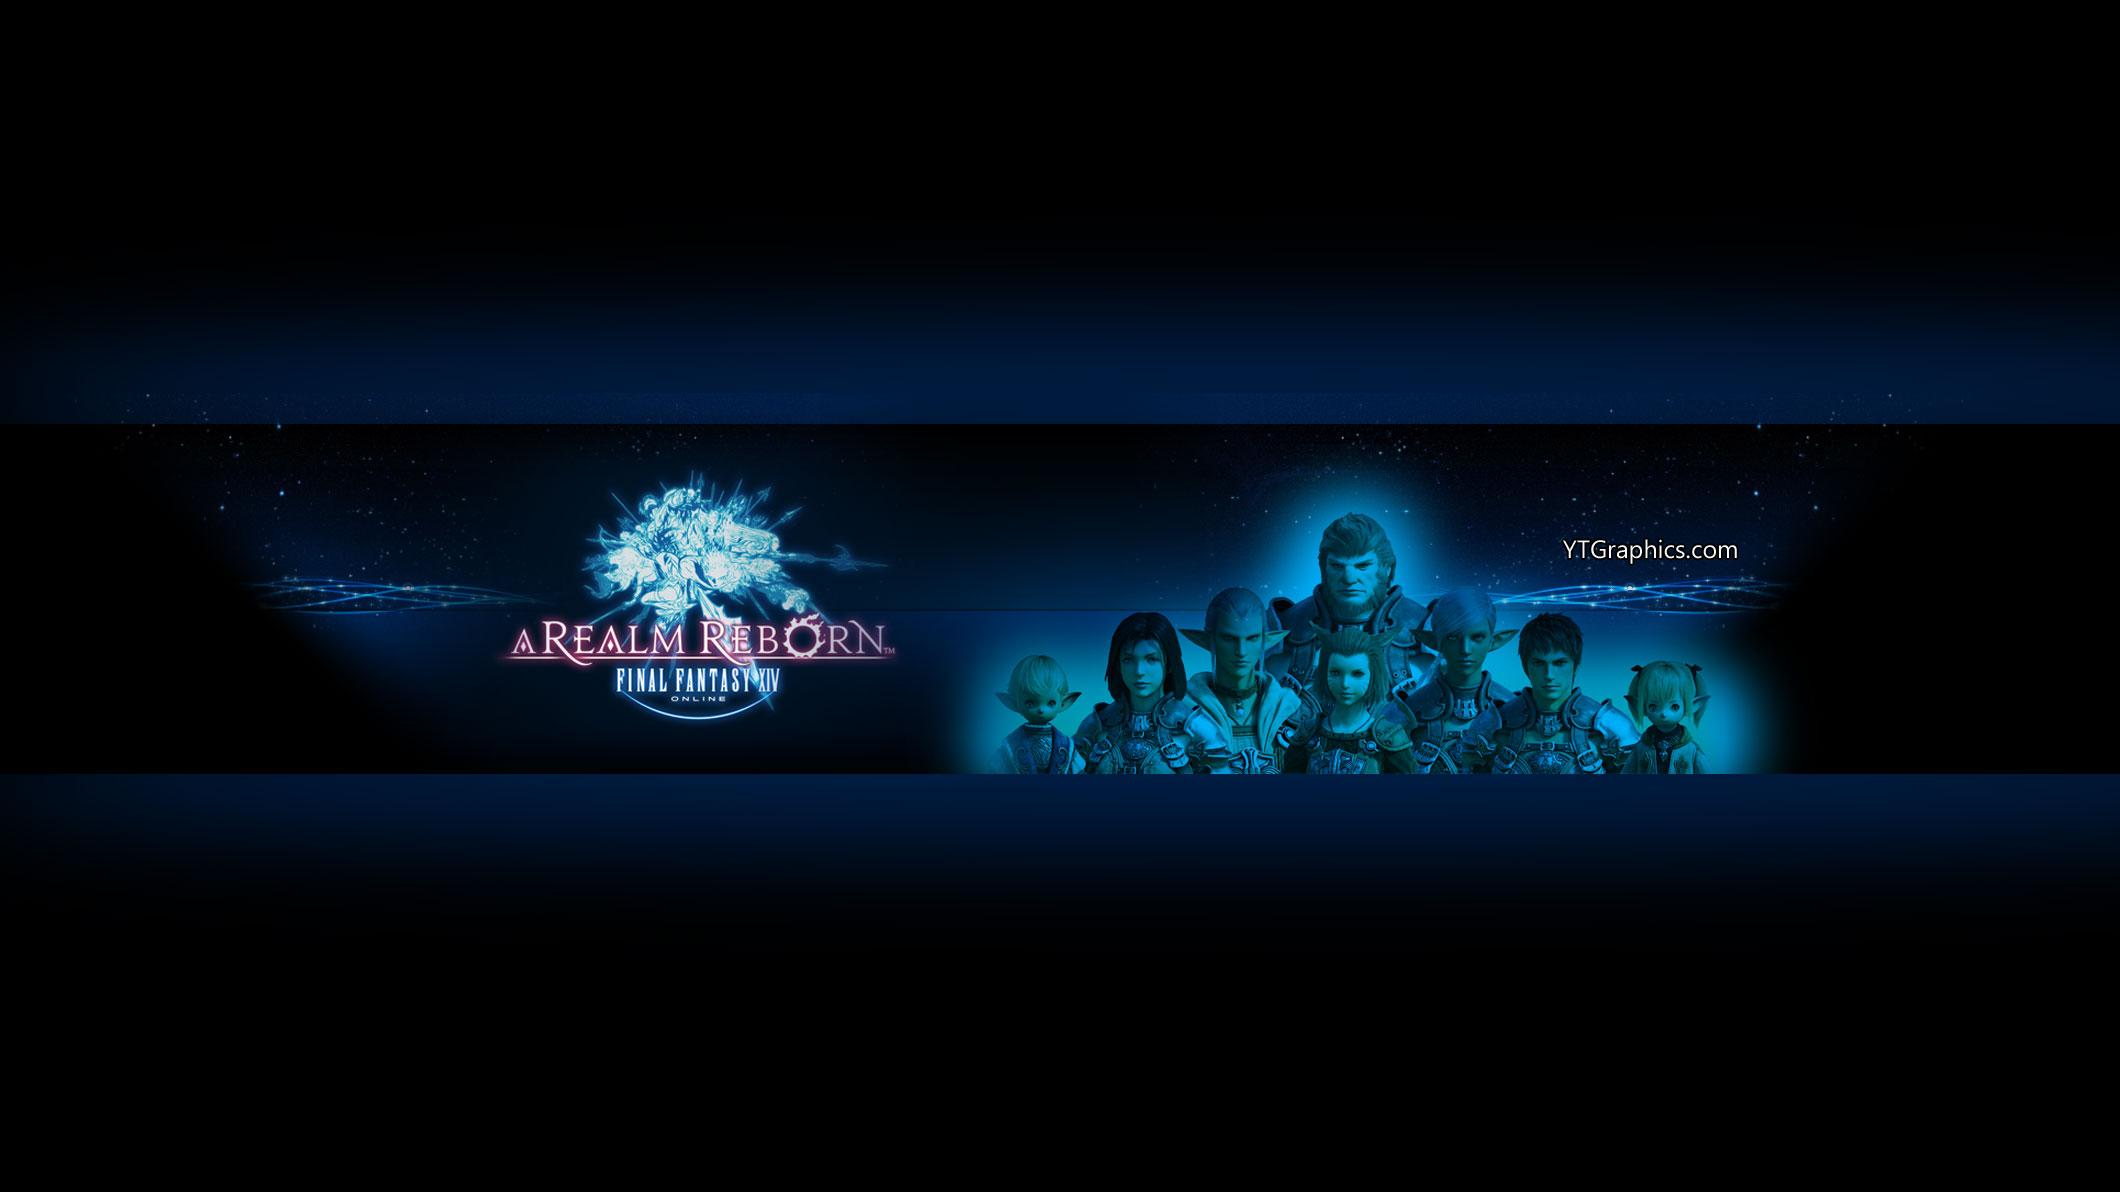 Final Fantasy XIV A Realm Reborn YouTube Channel Art Banner